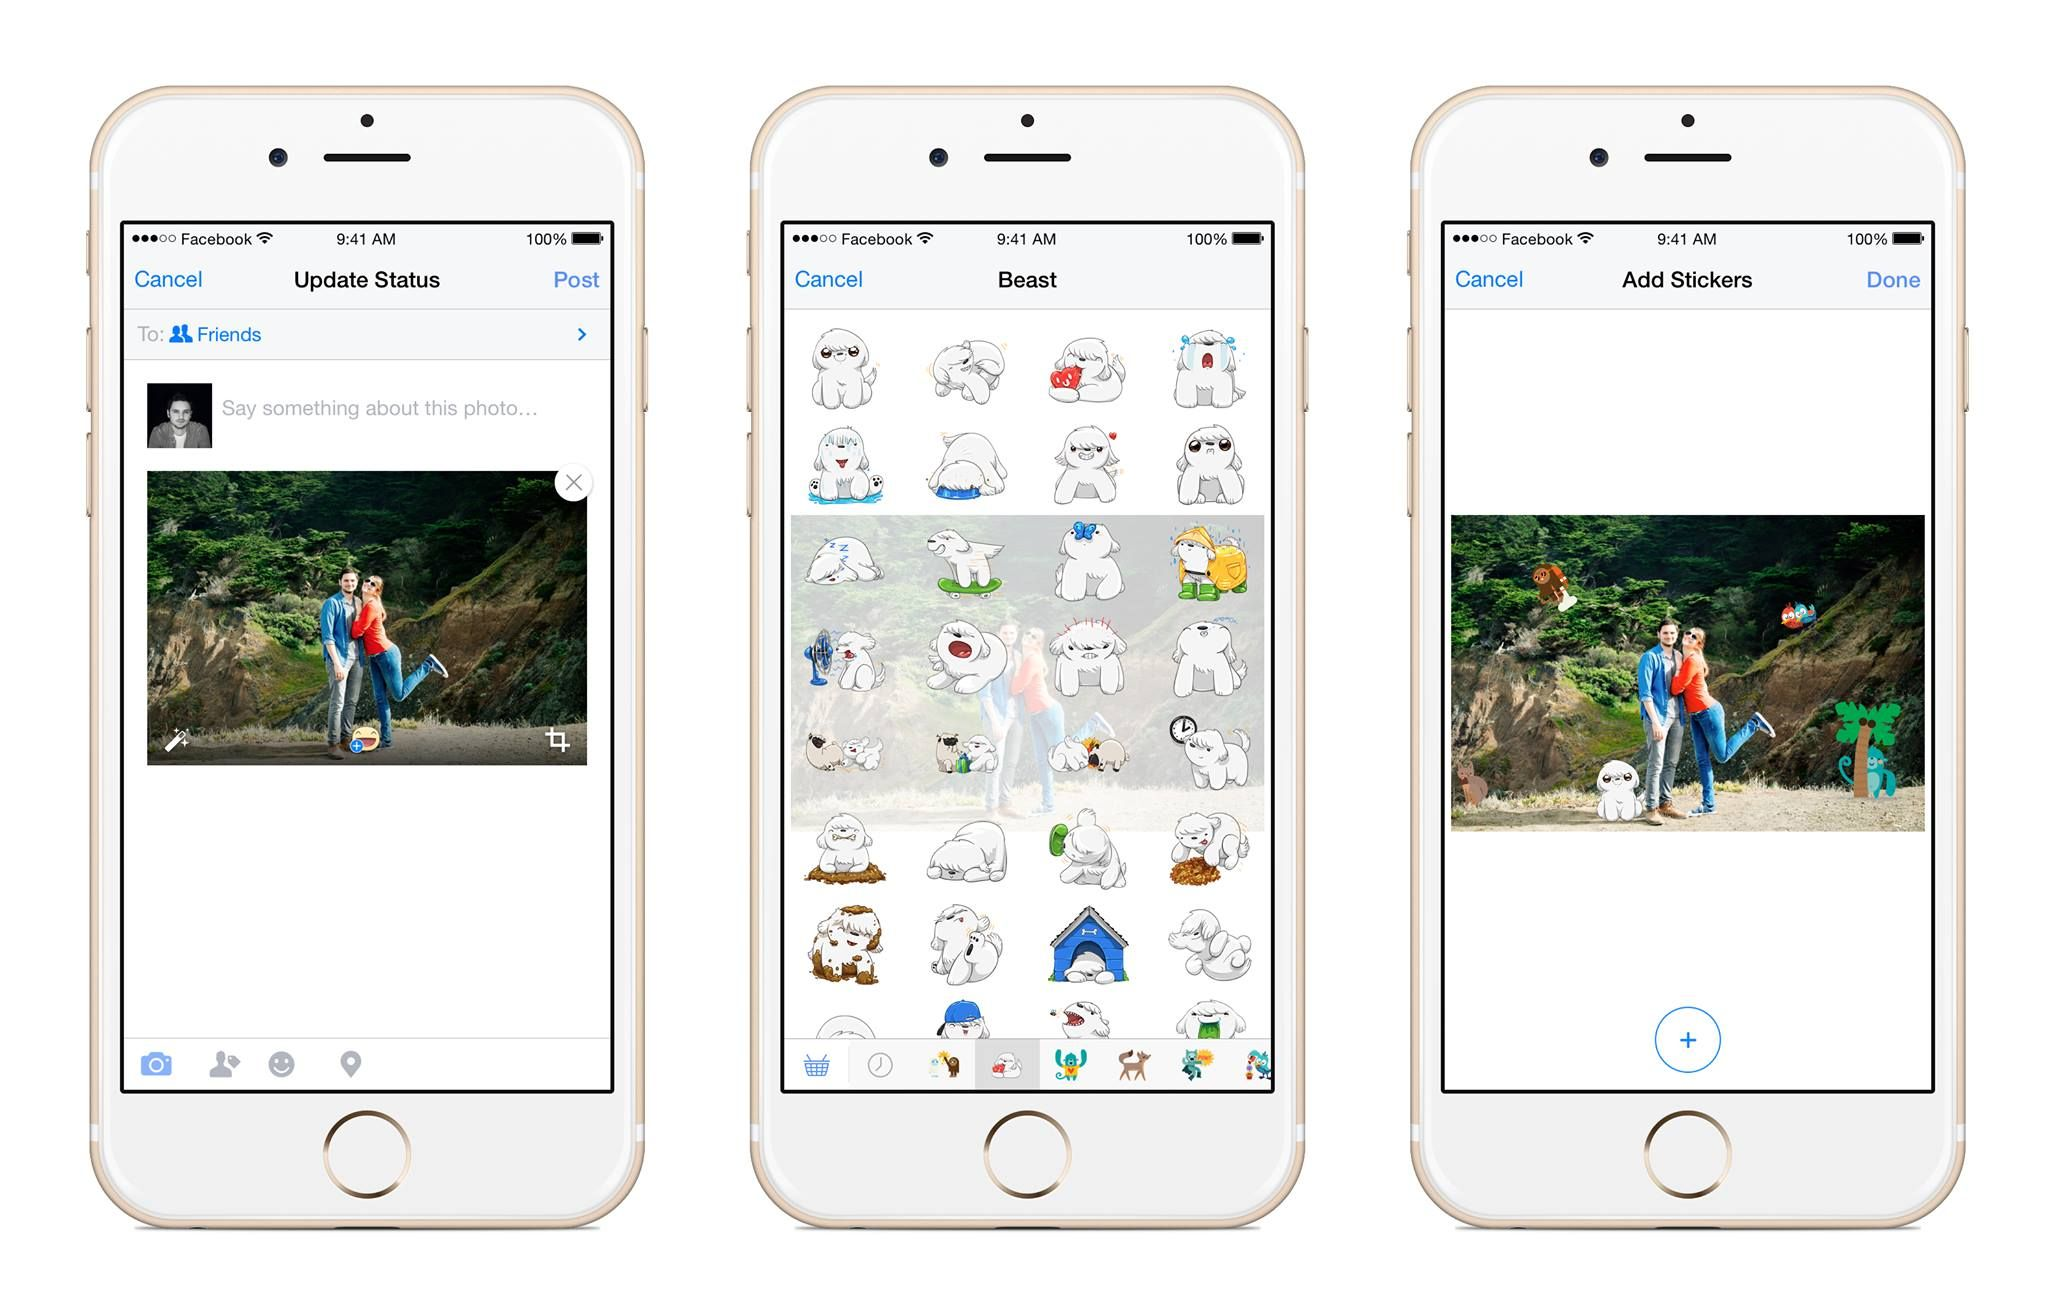 Facebook เปิดให้แต่งภาพด้วยสติ๊กเกอร์ก่อนอัพโหลดบน iOS และ Android แล้ว